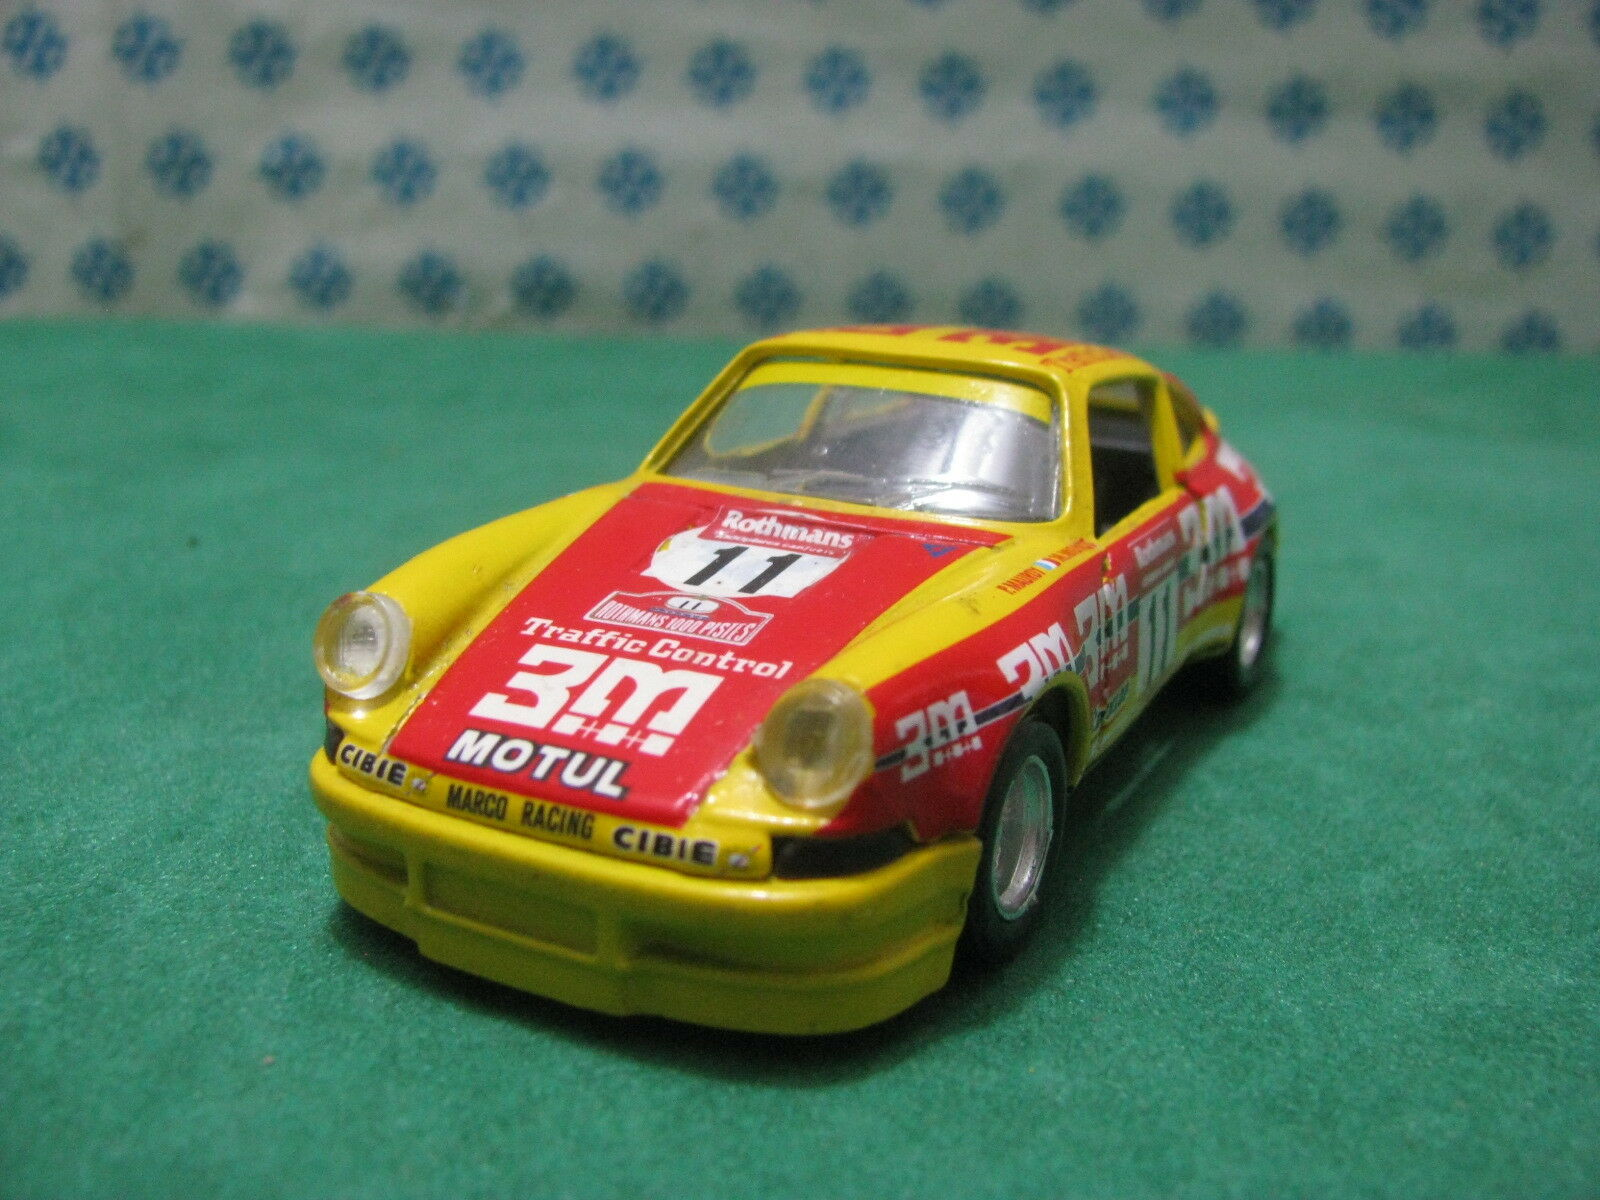 PORSCHE 911 bilrera RS 2800cc.rally 1000 Piss - 1  43 Transkit Verem